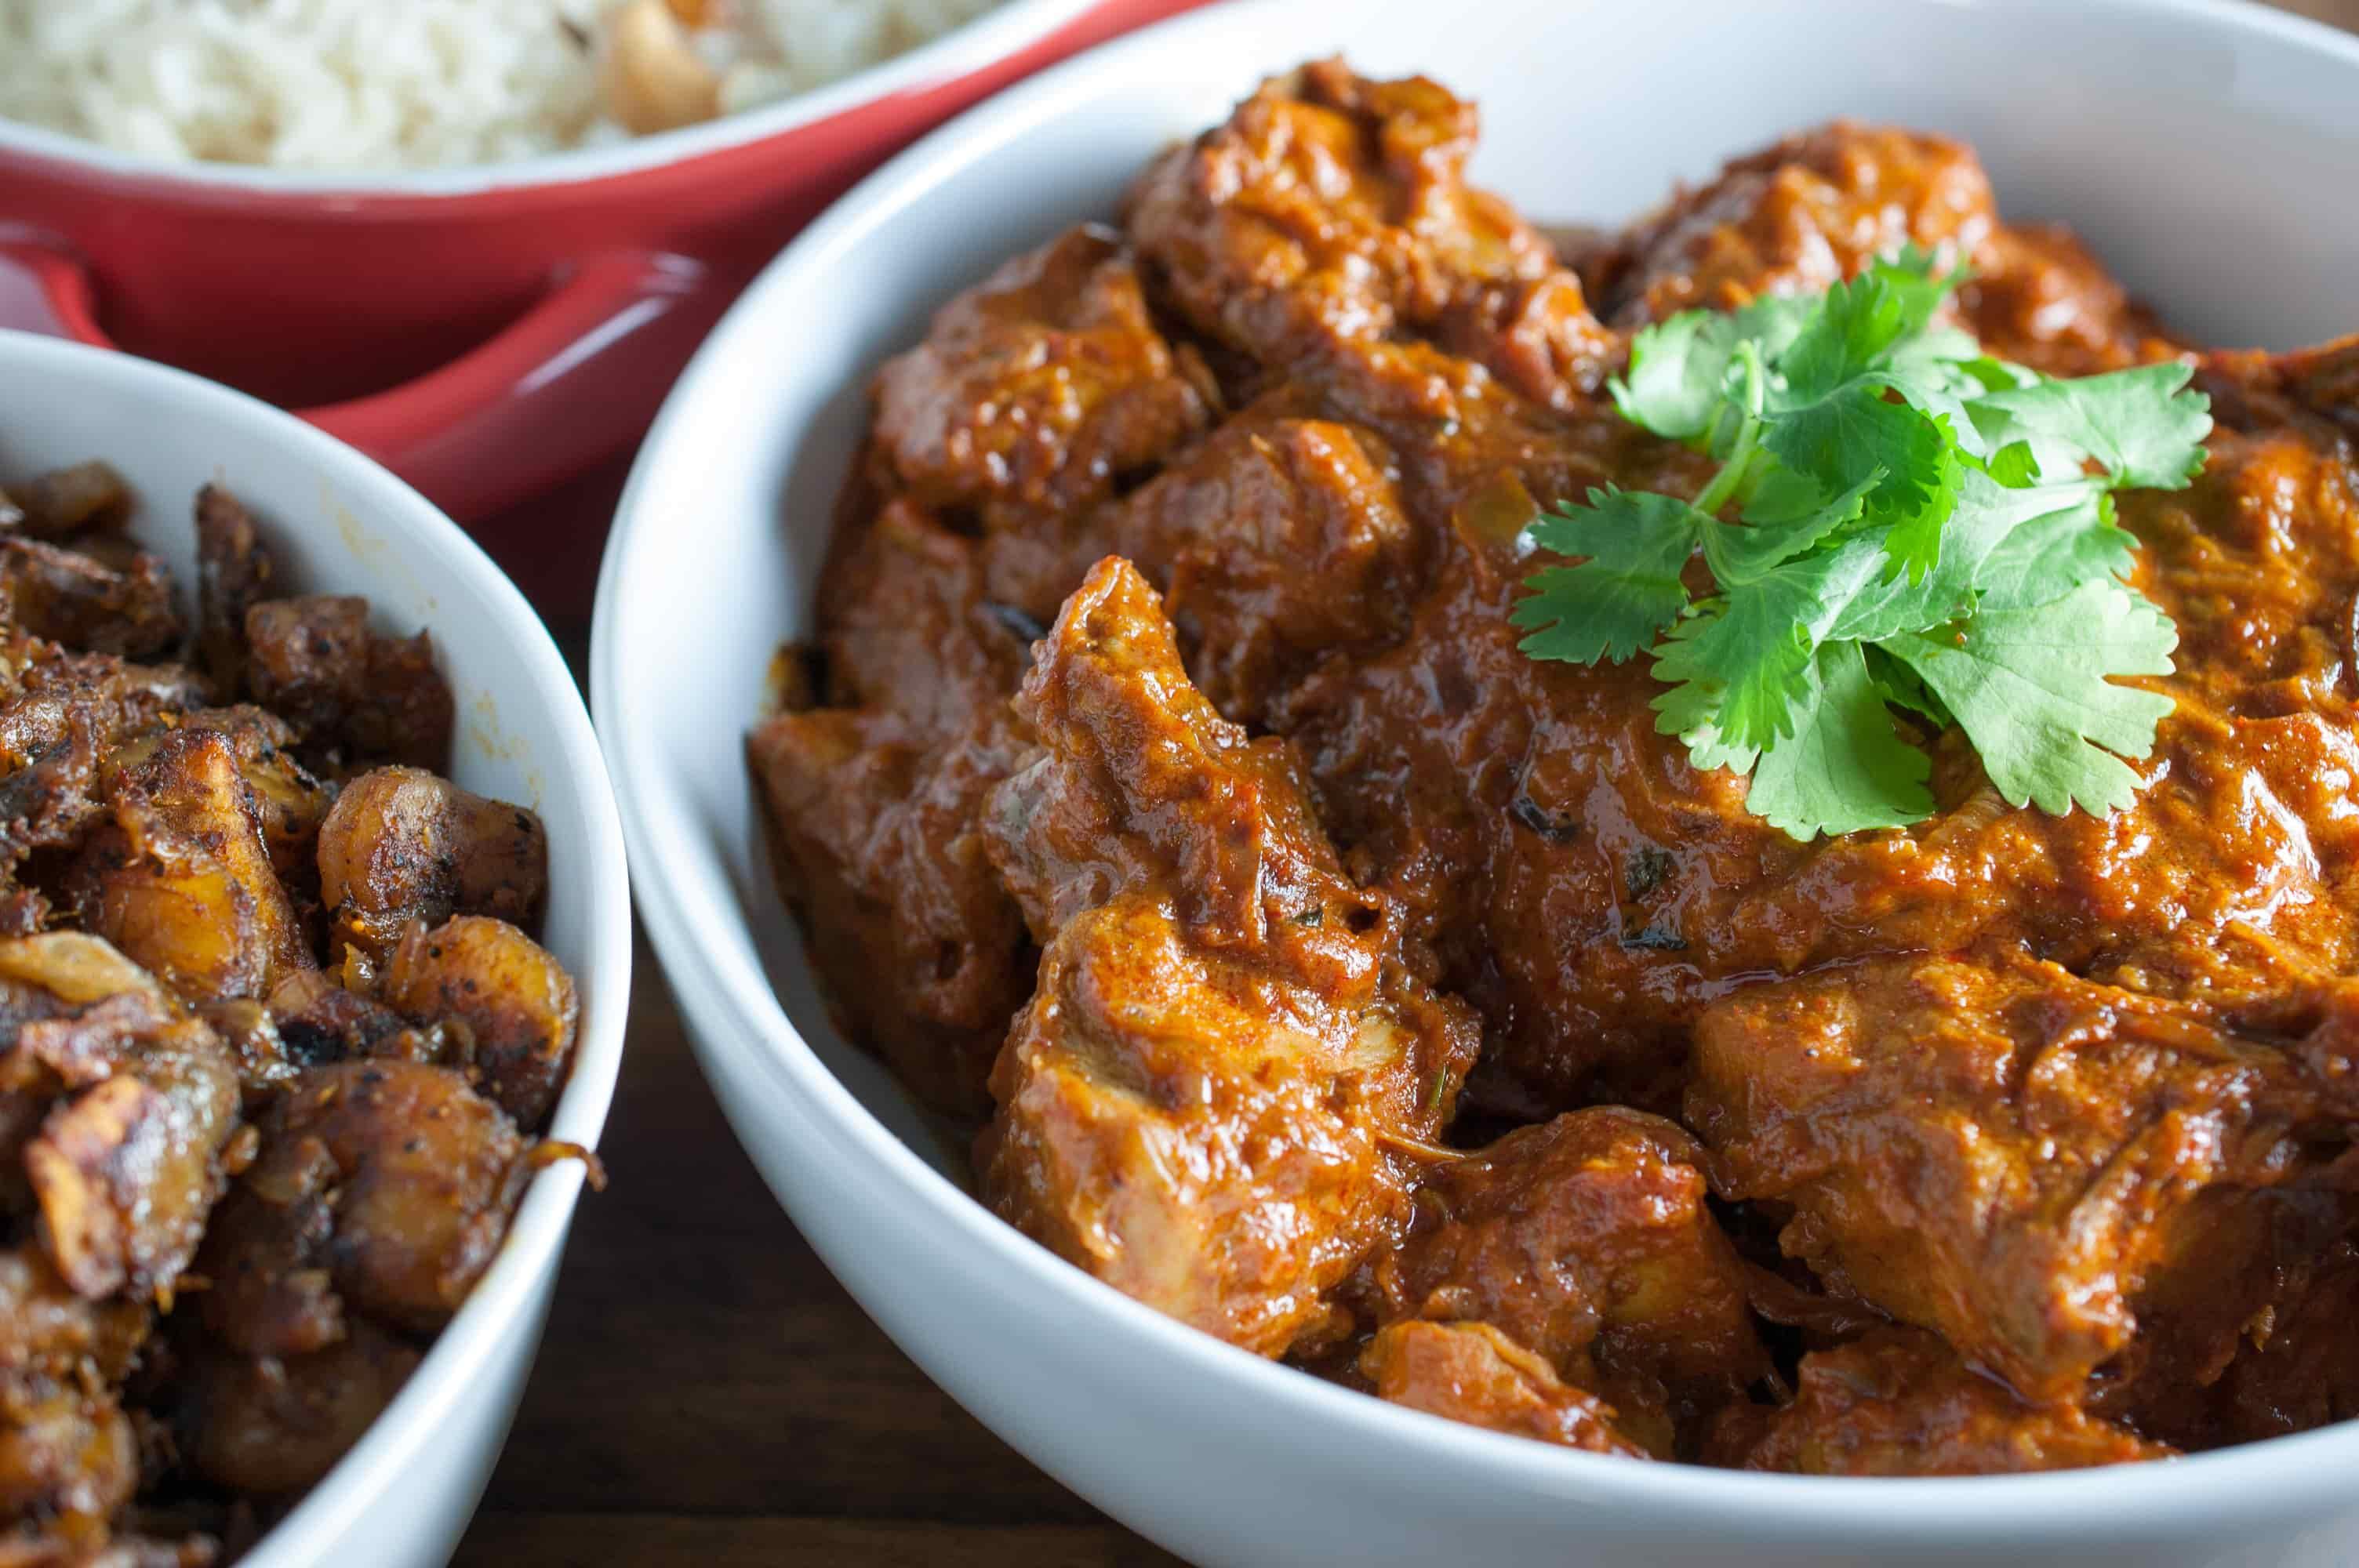 Kerala chicken curry recipe with coconut milk (Nadan chicken curry)